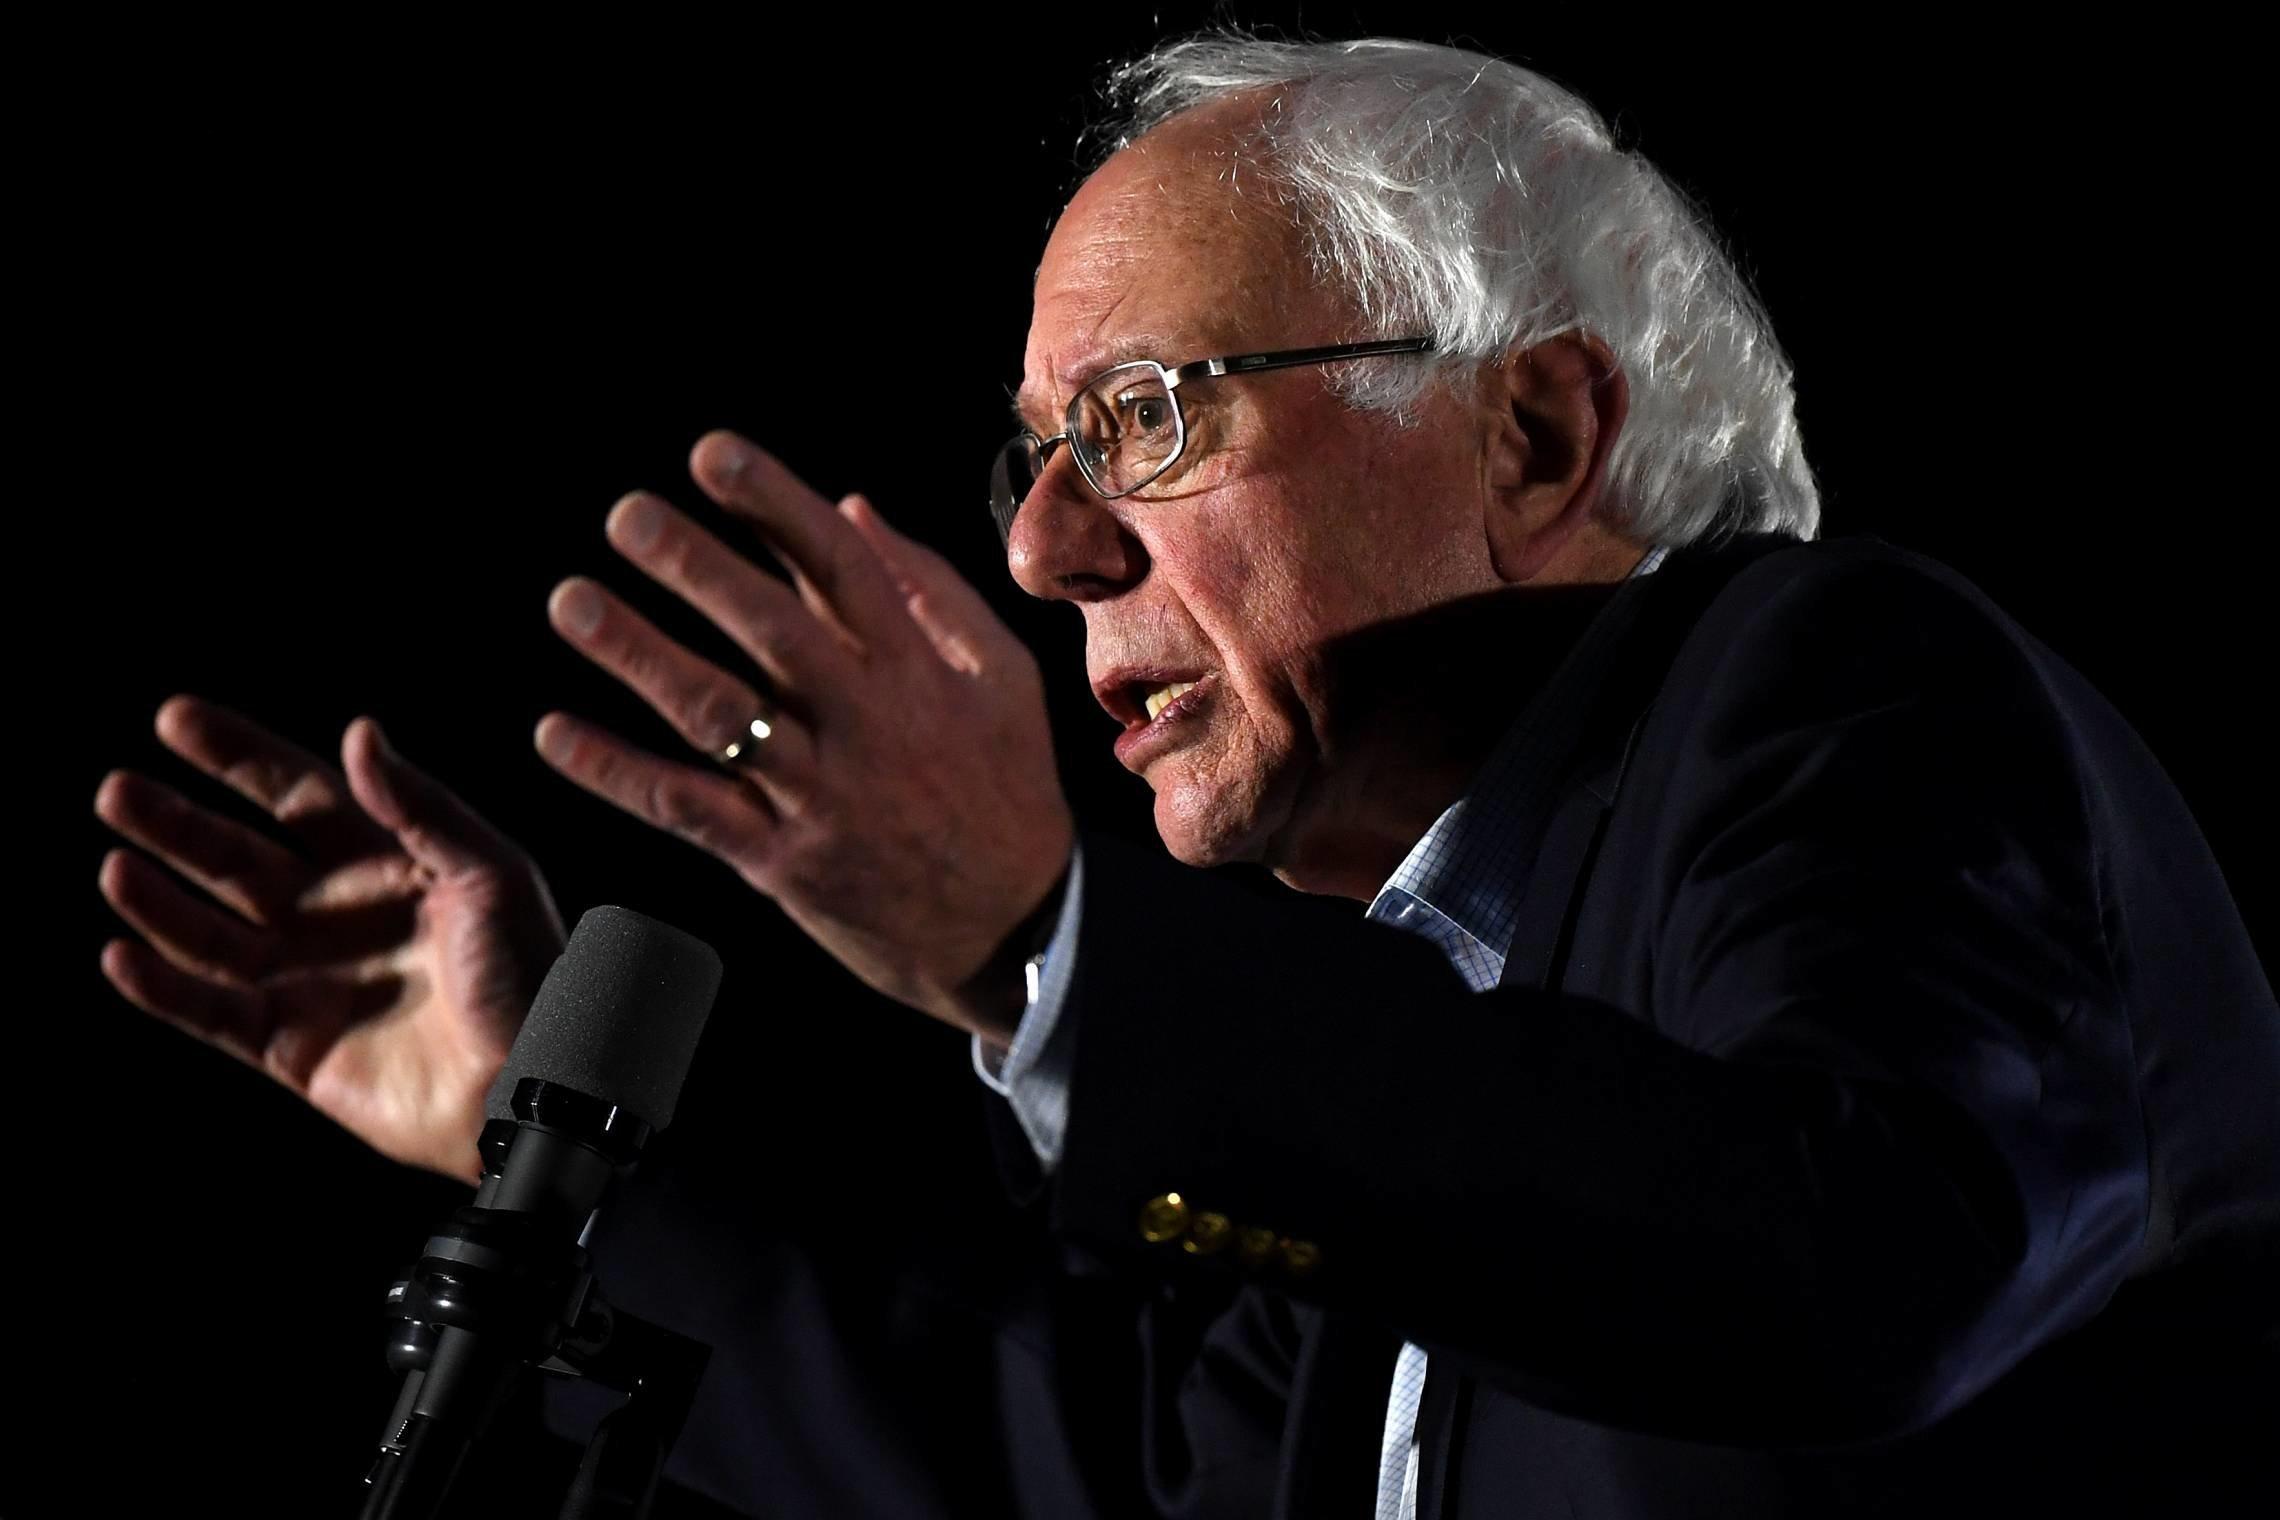 Bernie Sanders' Possible 2020 Presidential Bid Will Feature a 'Bigger Campaign'